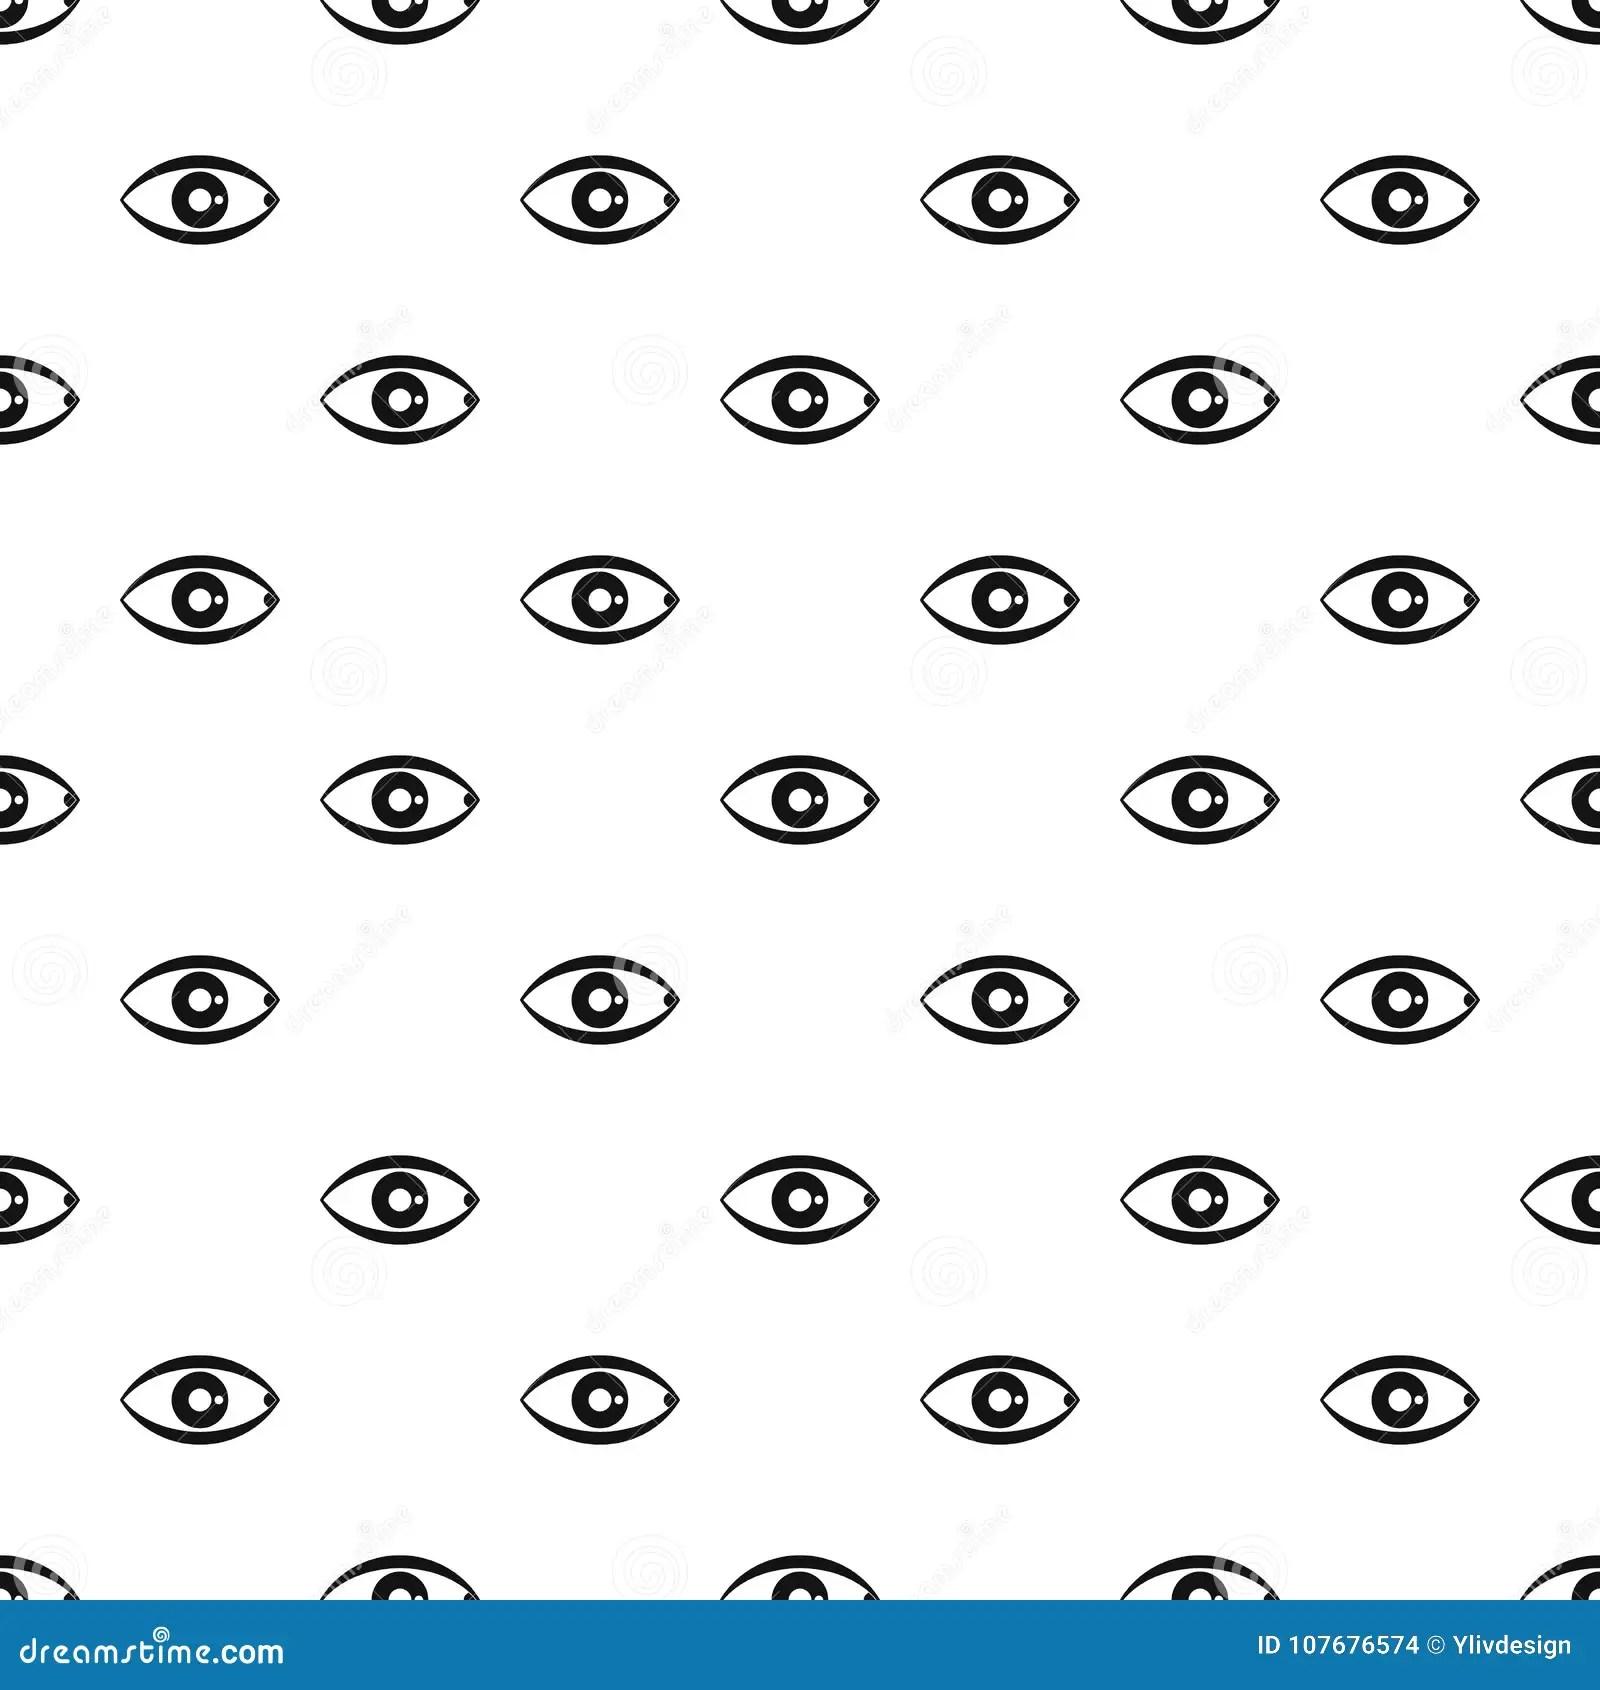 Human Eye Pattern Vector Stock Vector Illustration Of